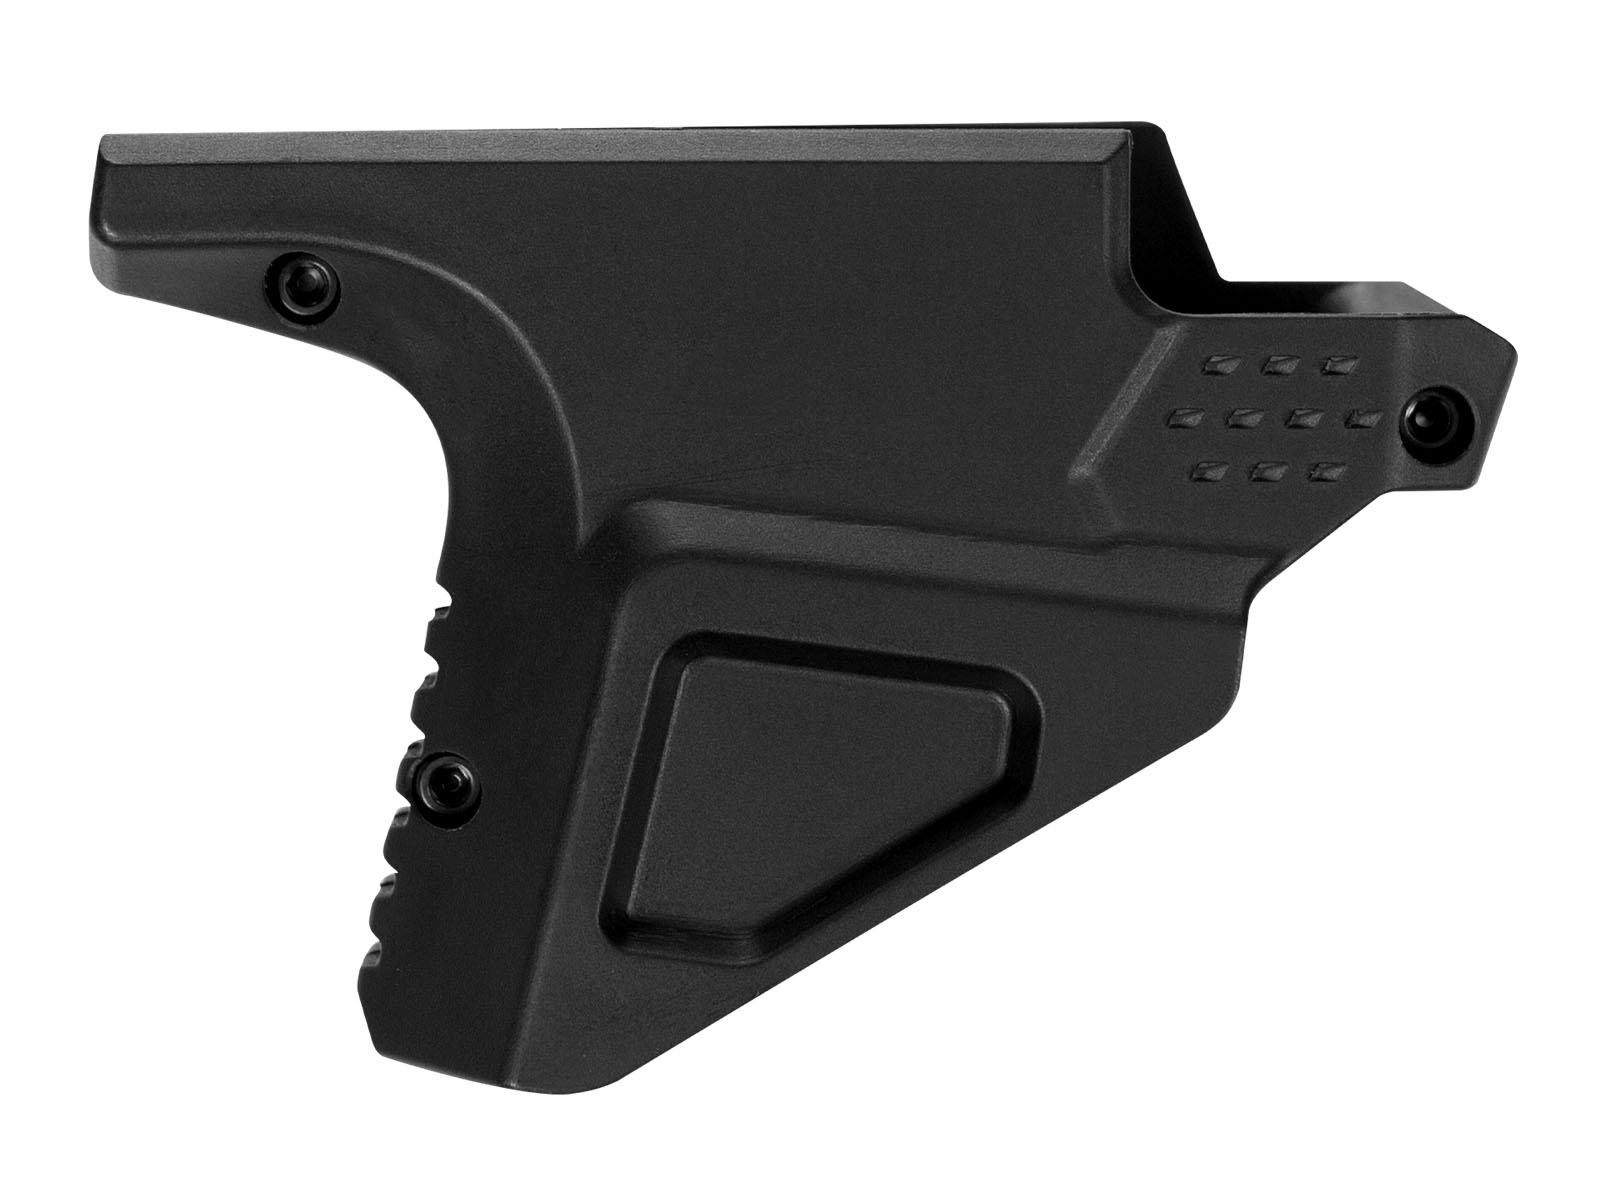 EVO ATEK – Magwell Midcap product image